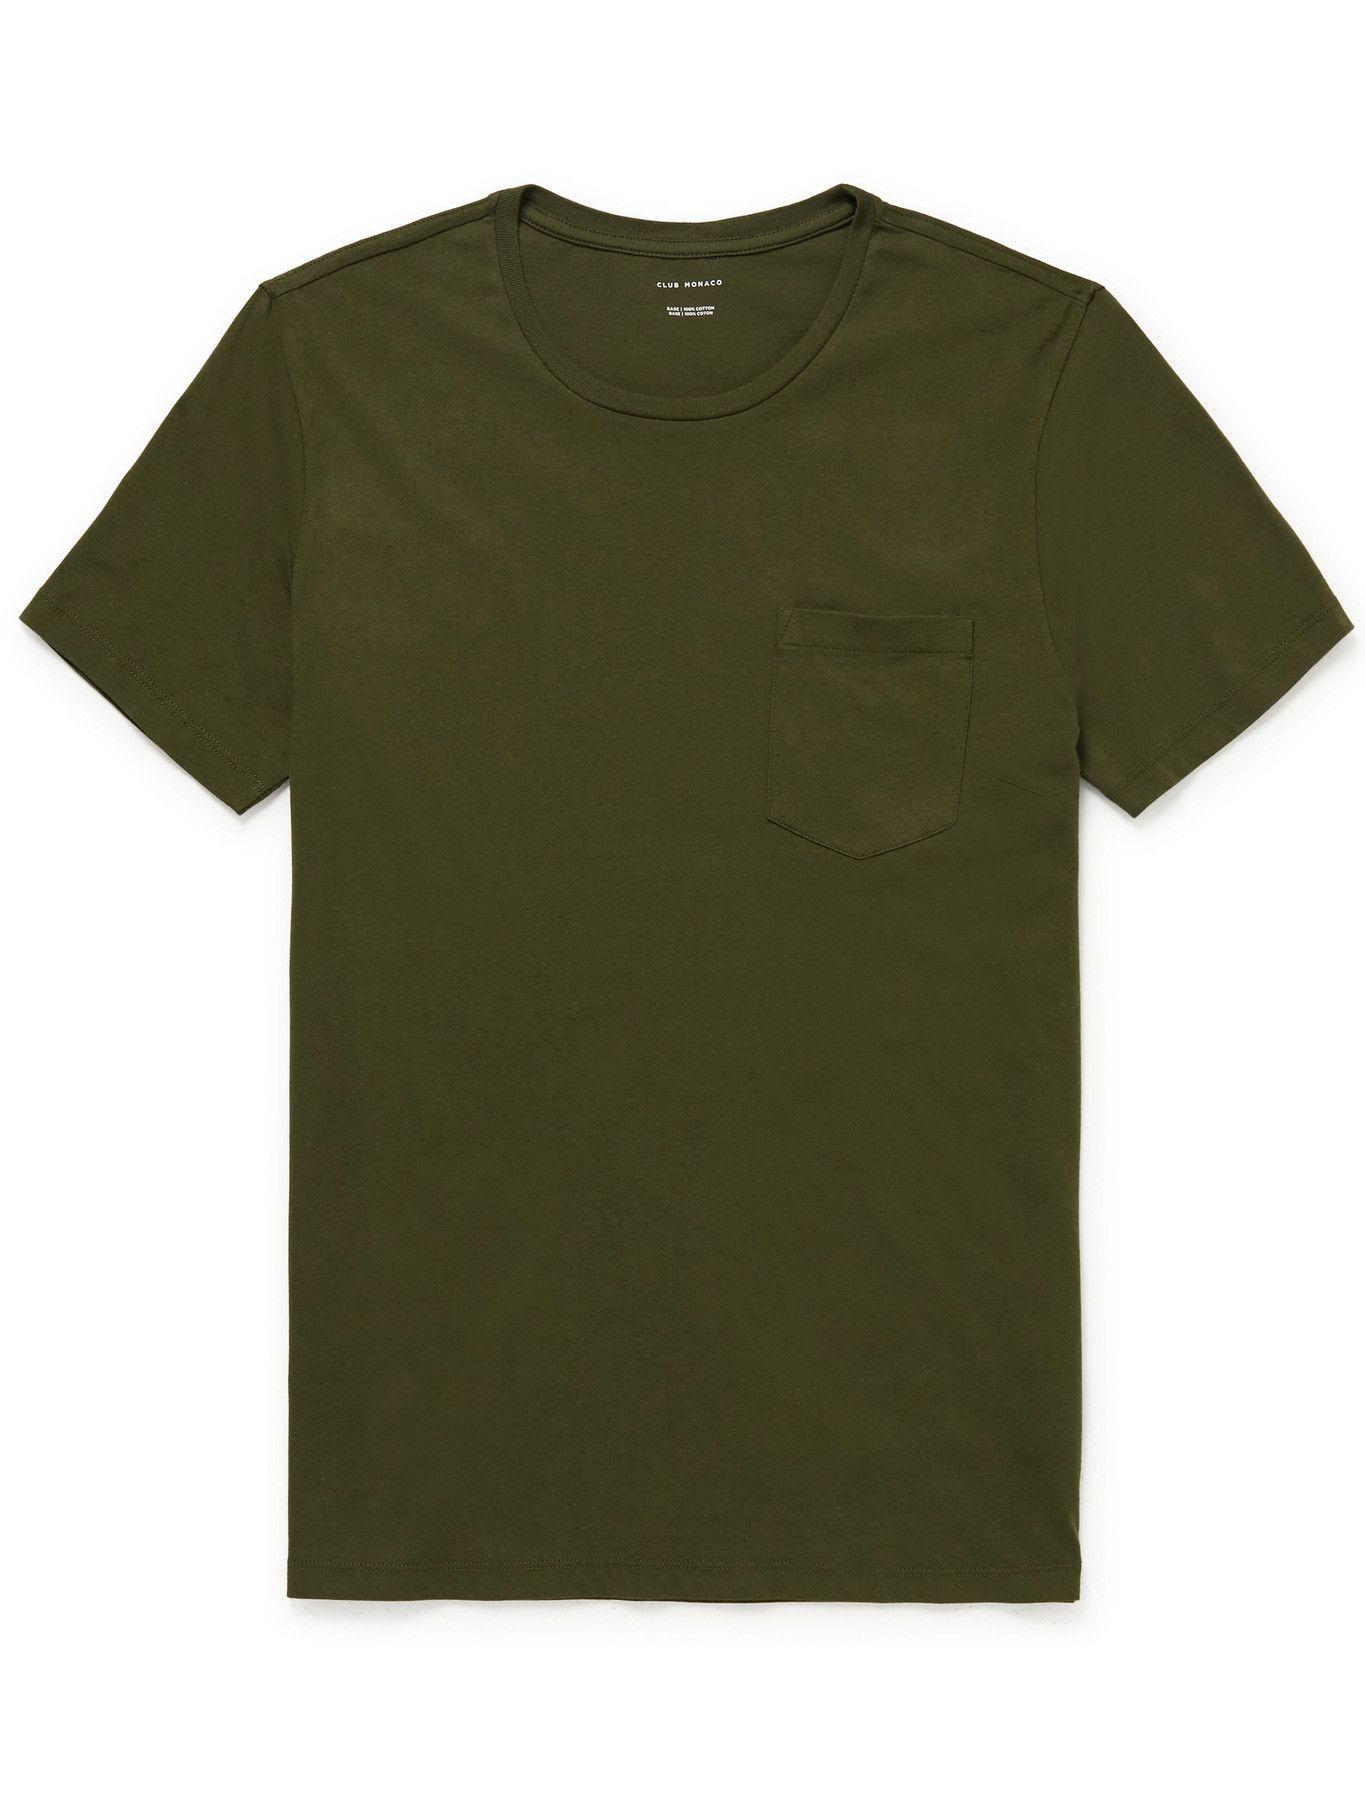 Club Monaco - Williams Cotton-Jersey T-Shirt - Green